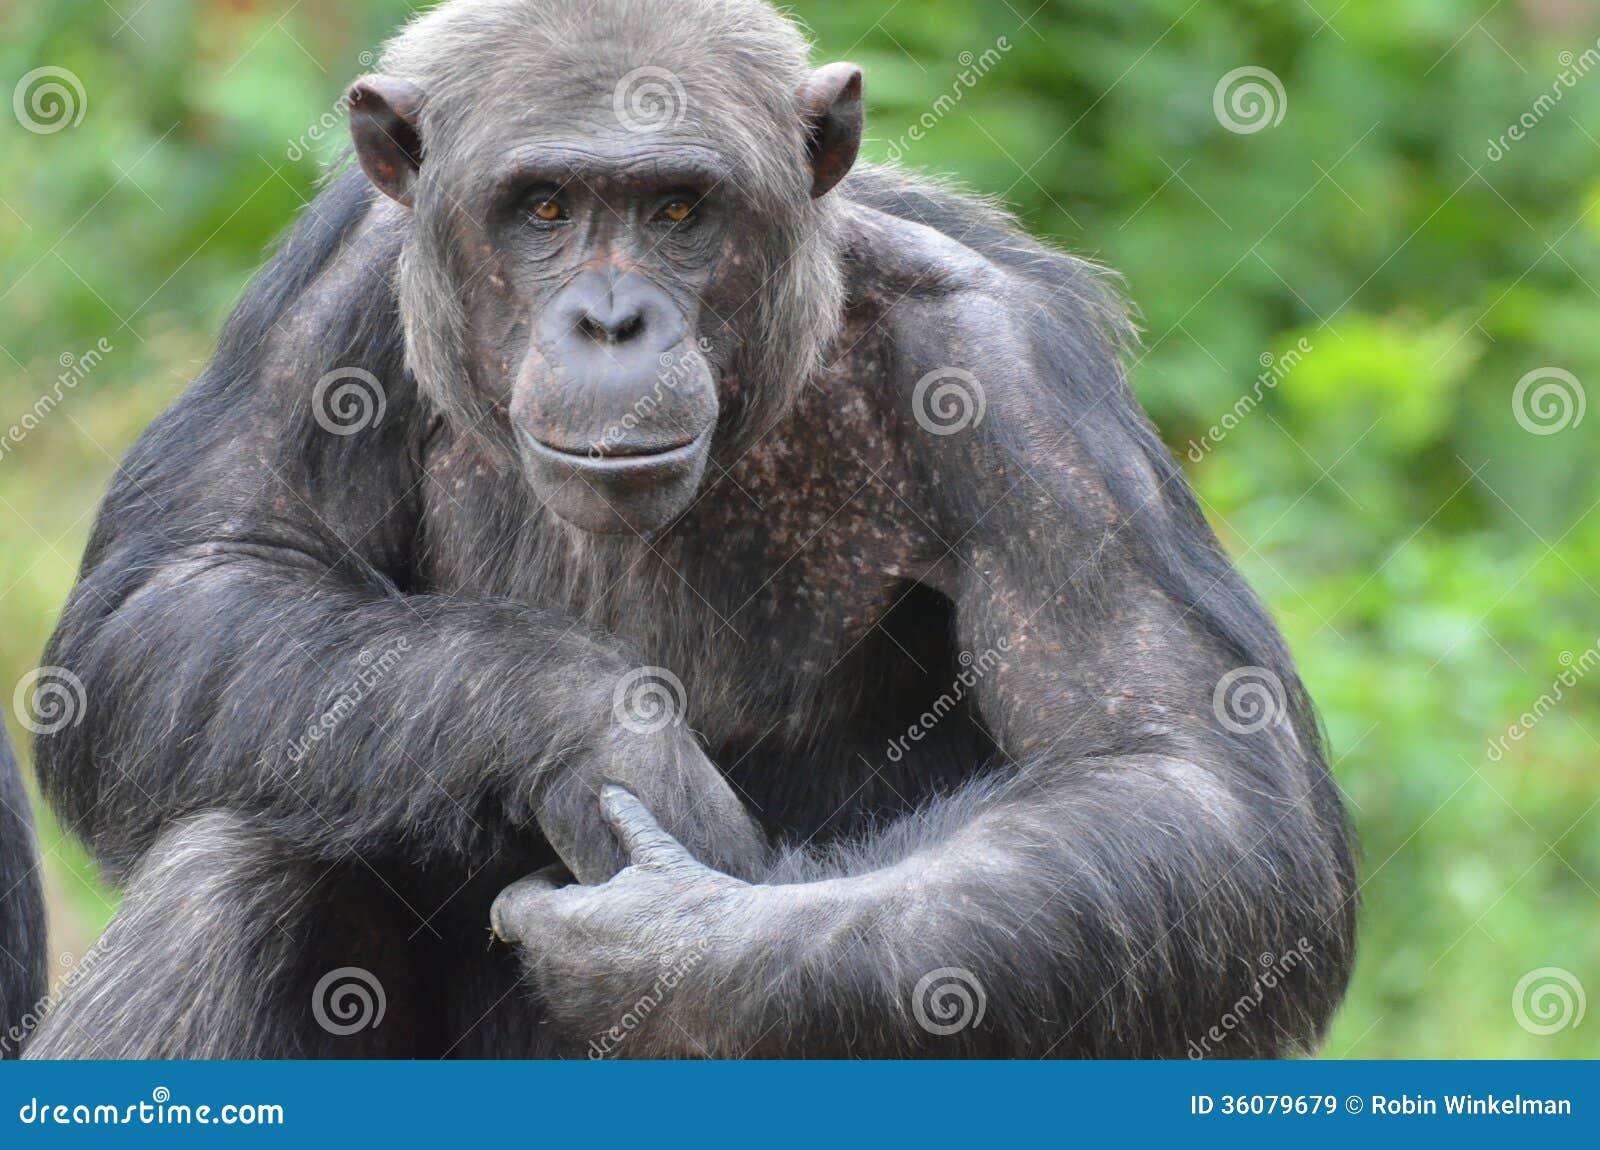 Chimp Murder in Mahale | Nomad Tanzania